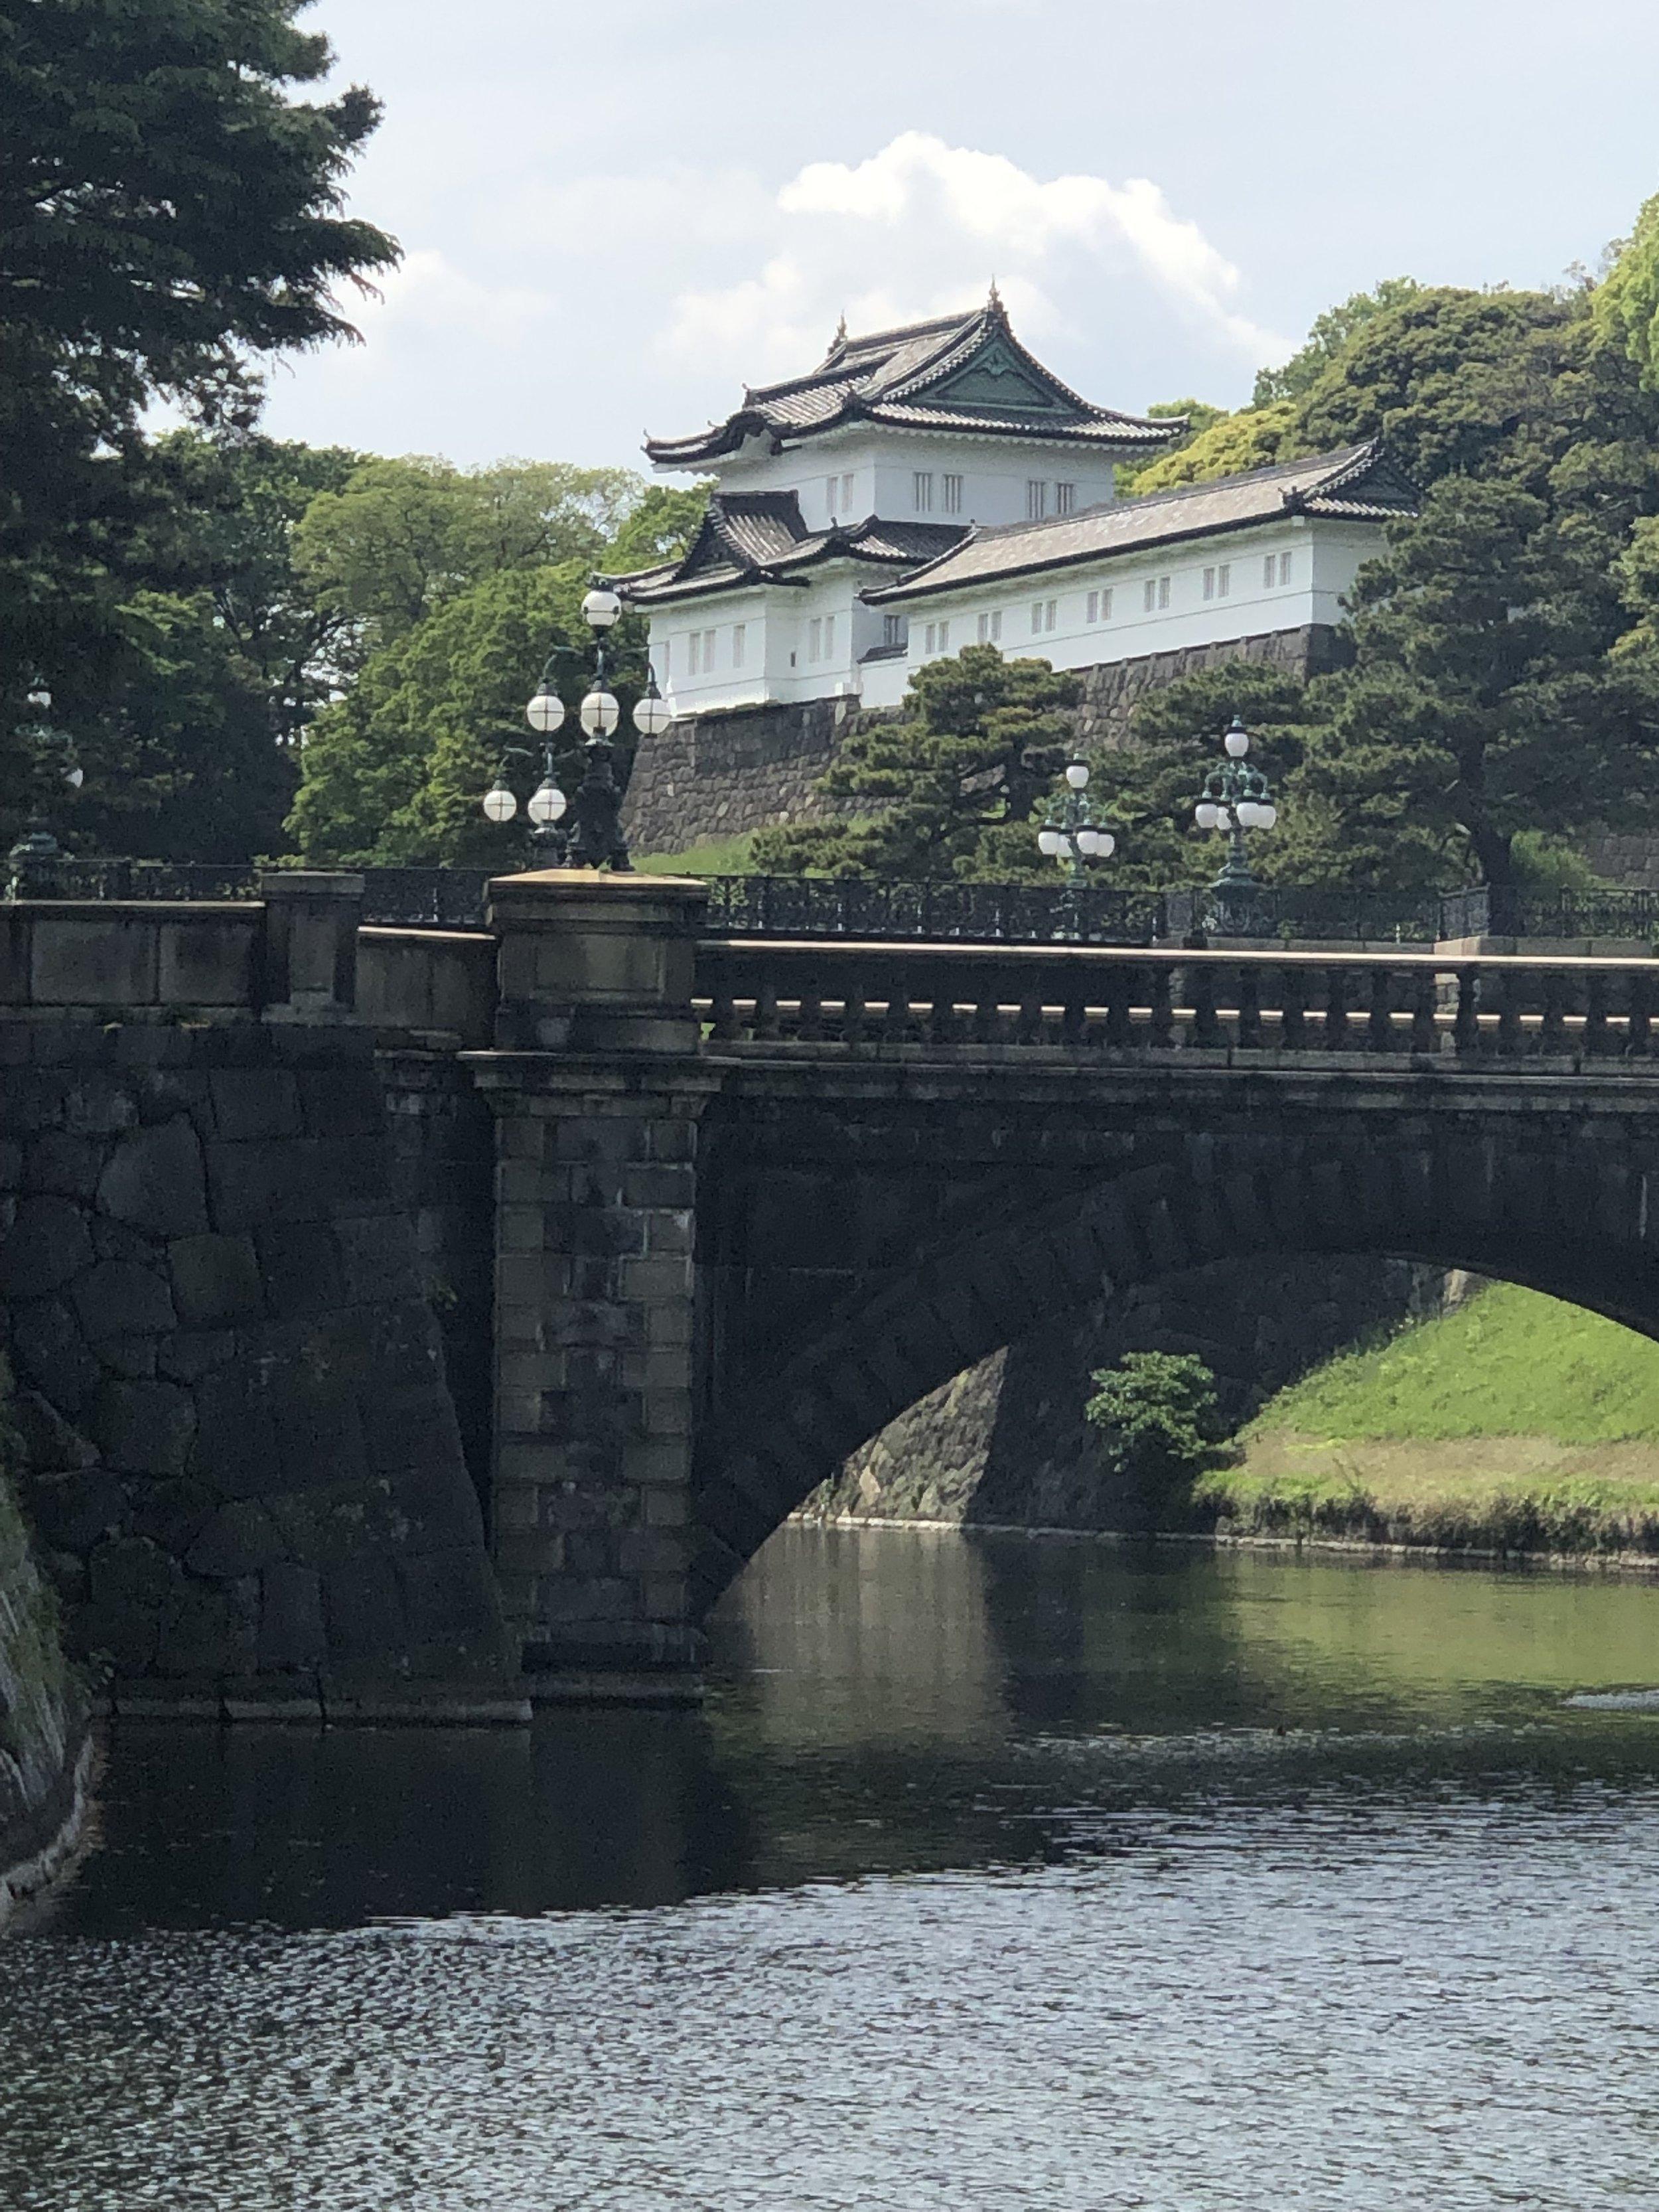 Imperial Palace and Nijubashi Bridge